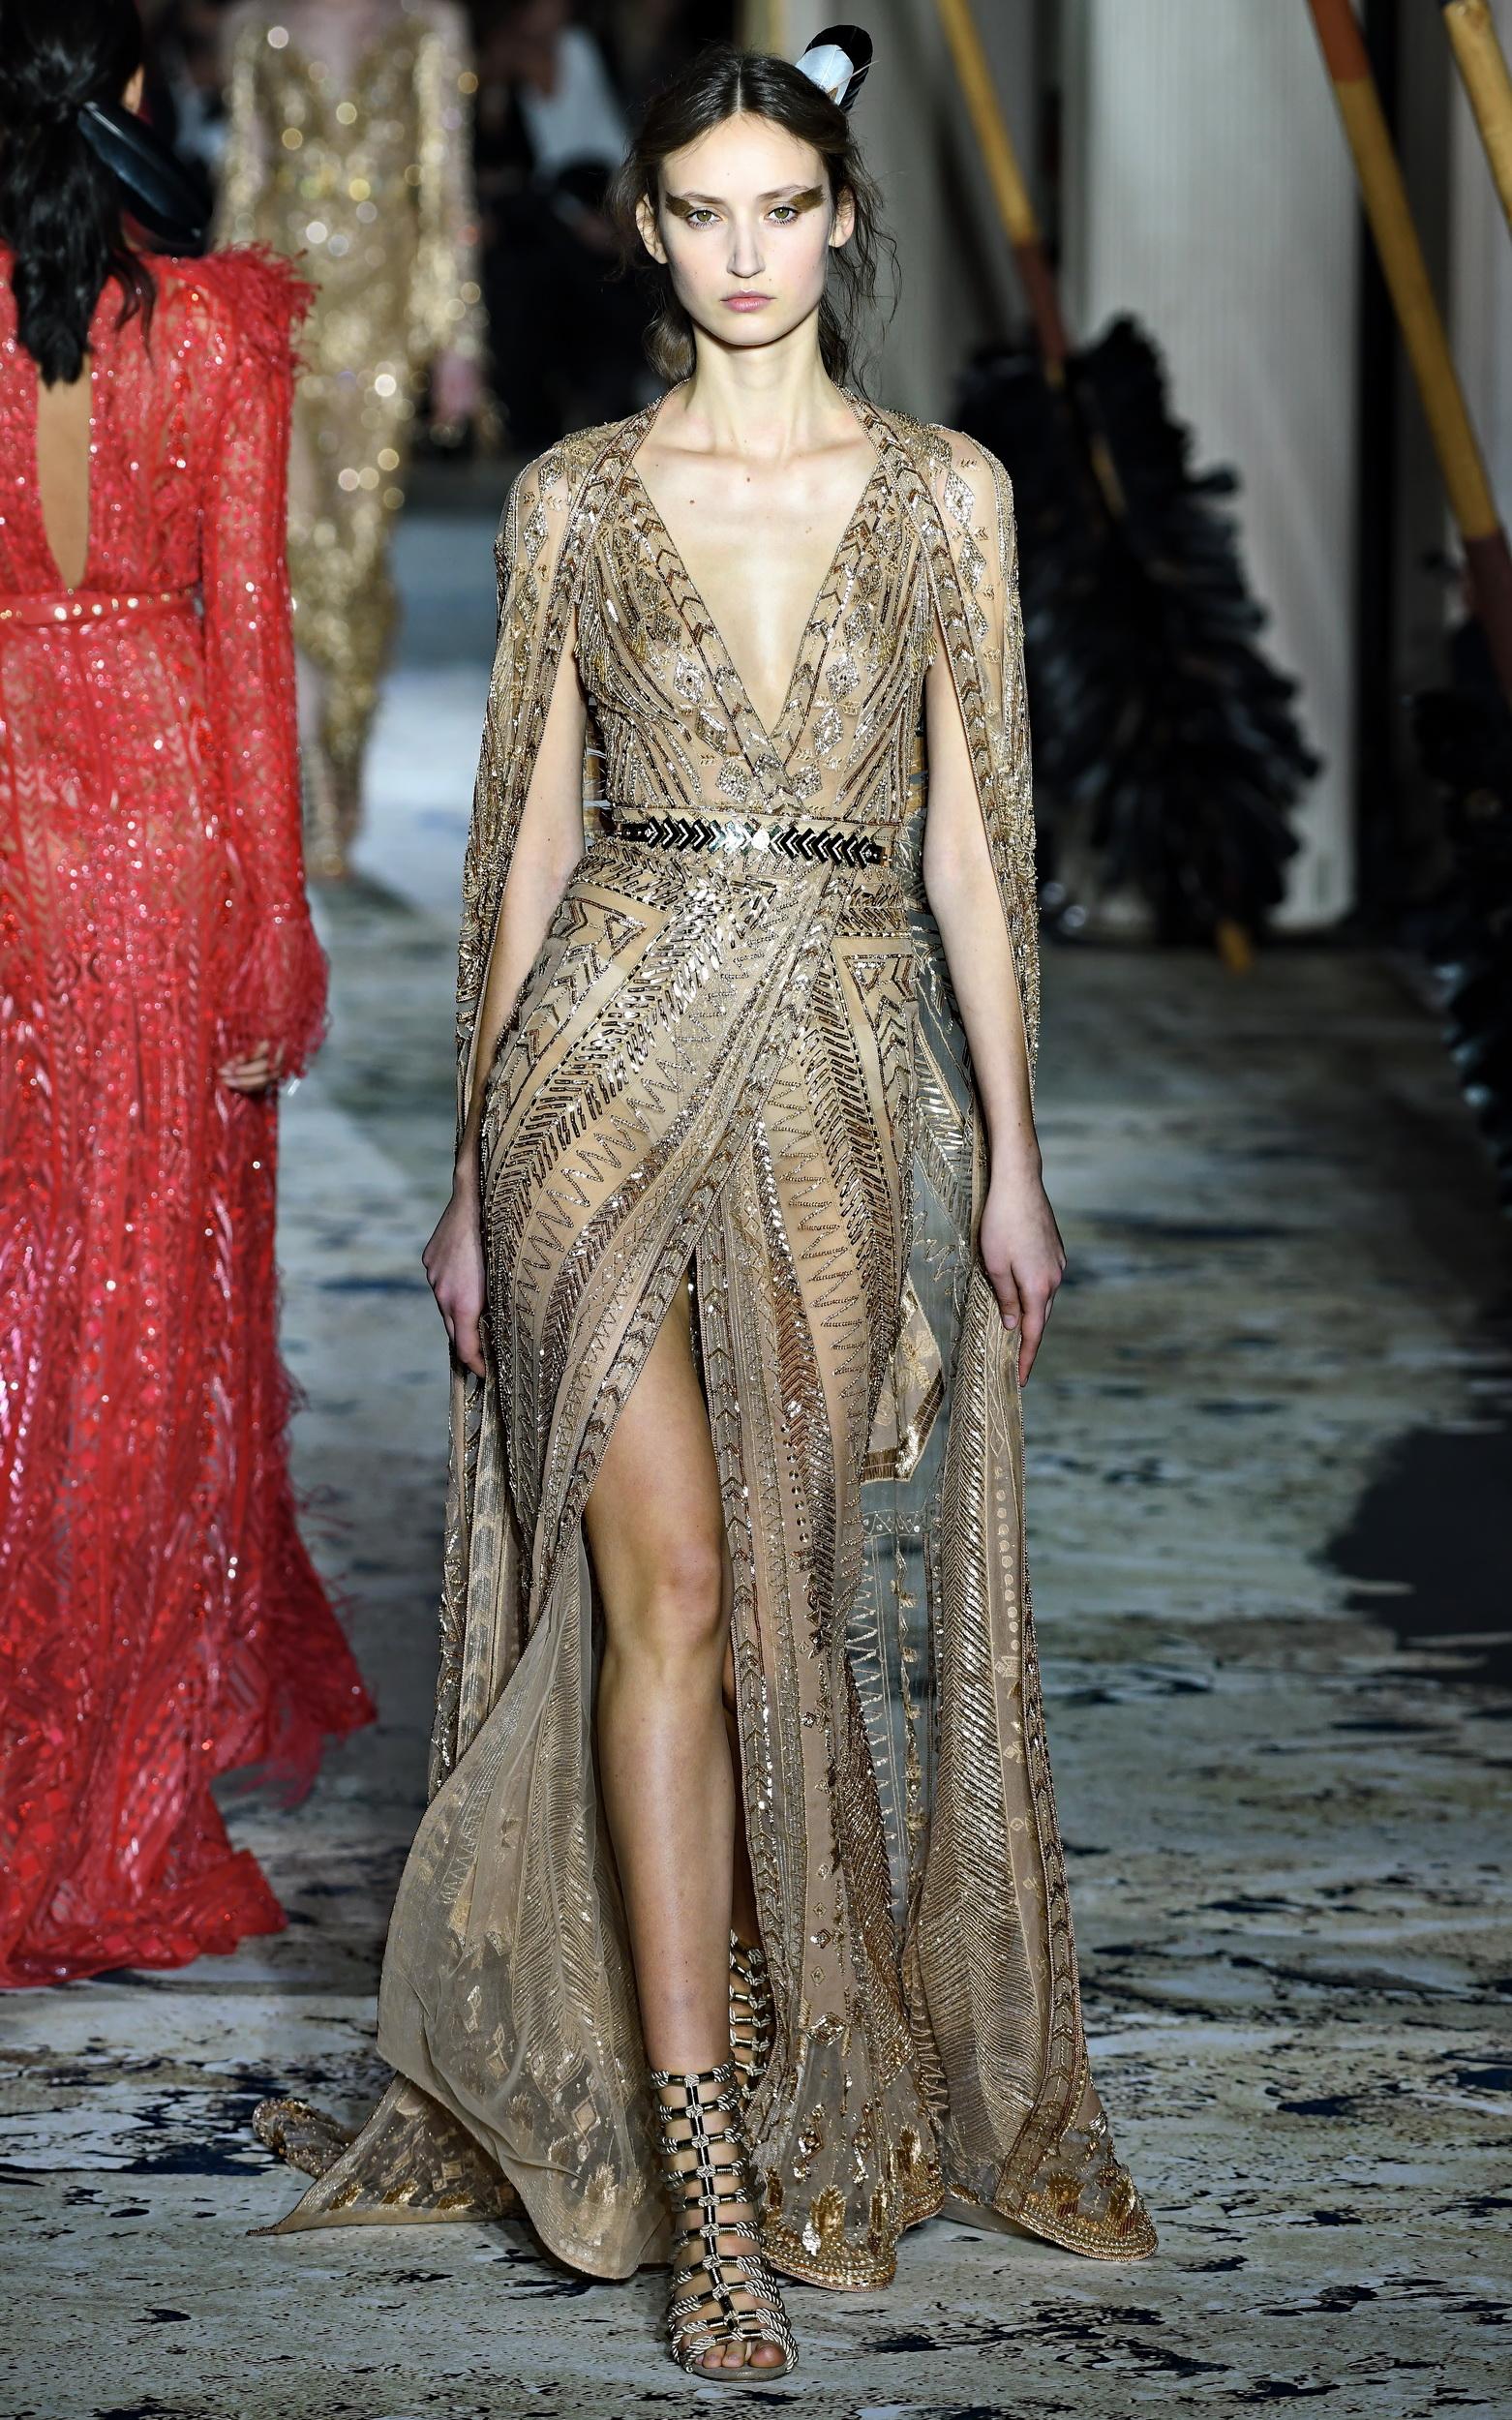 Paris Haute Couture SS 2018 Zuhair Murad 4to4u Arthur Koff 12.JPG